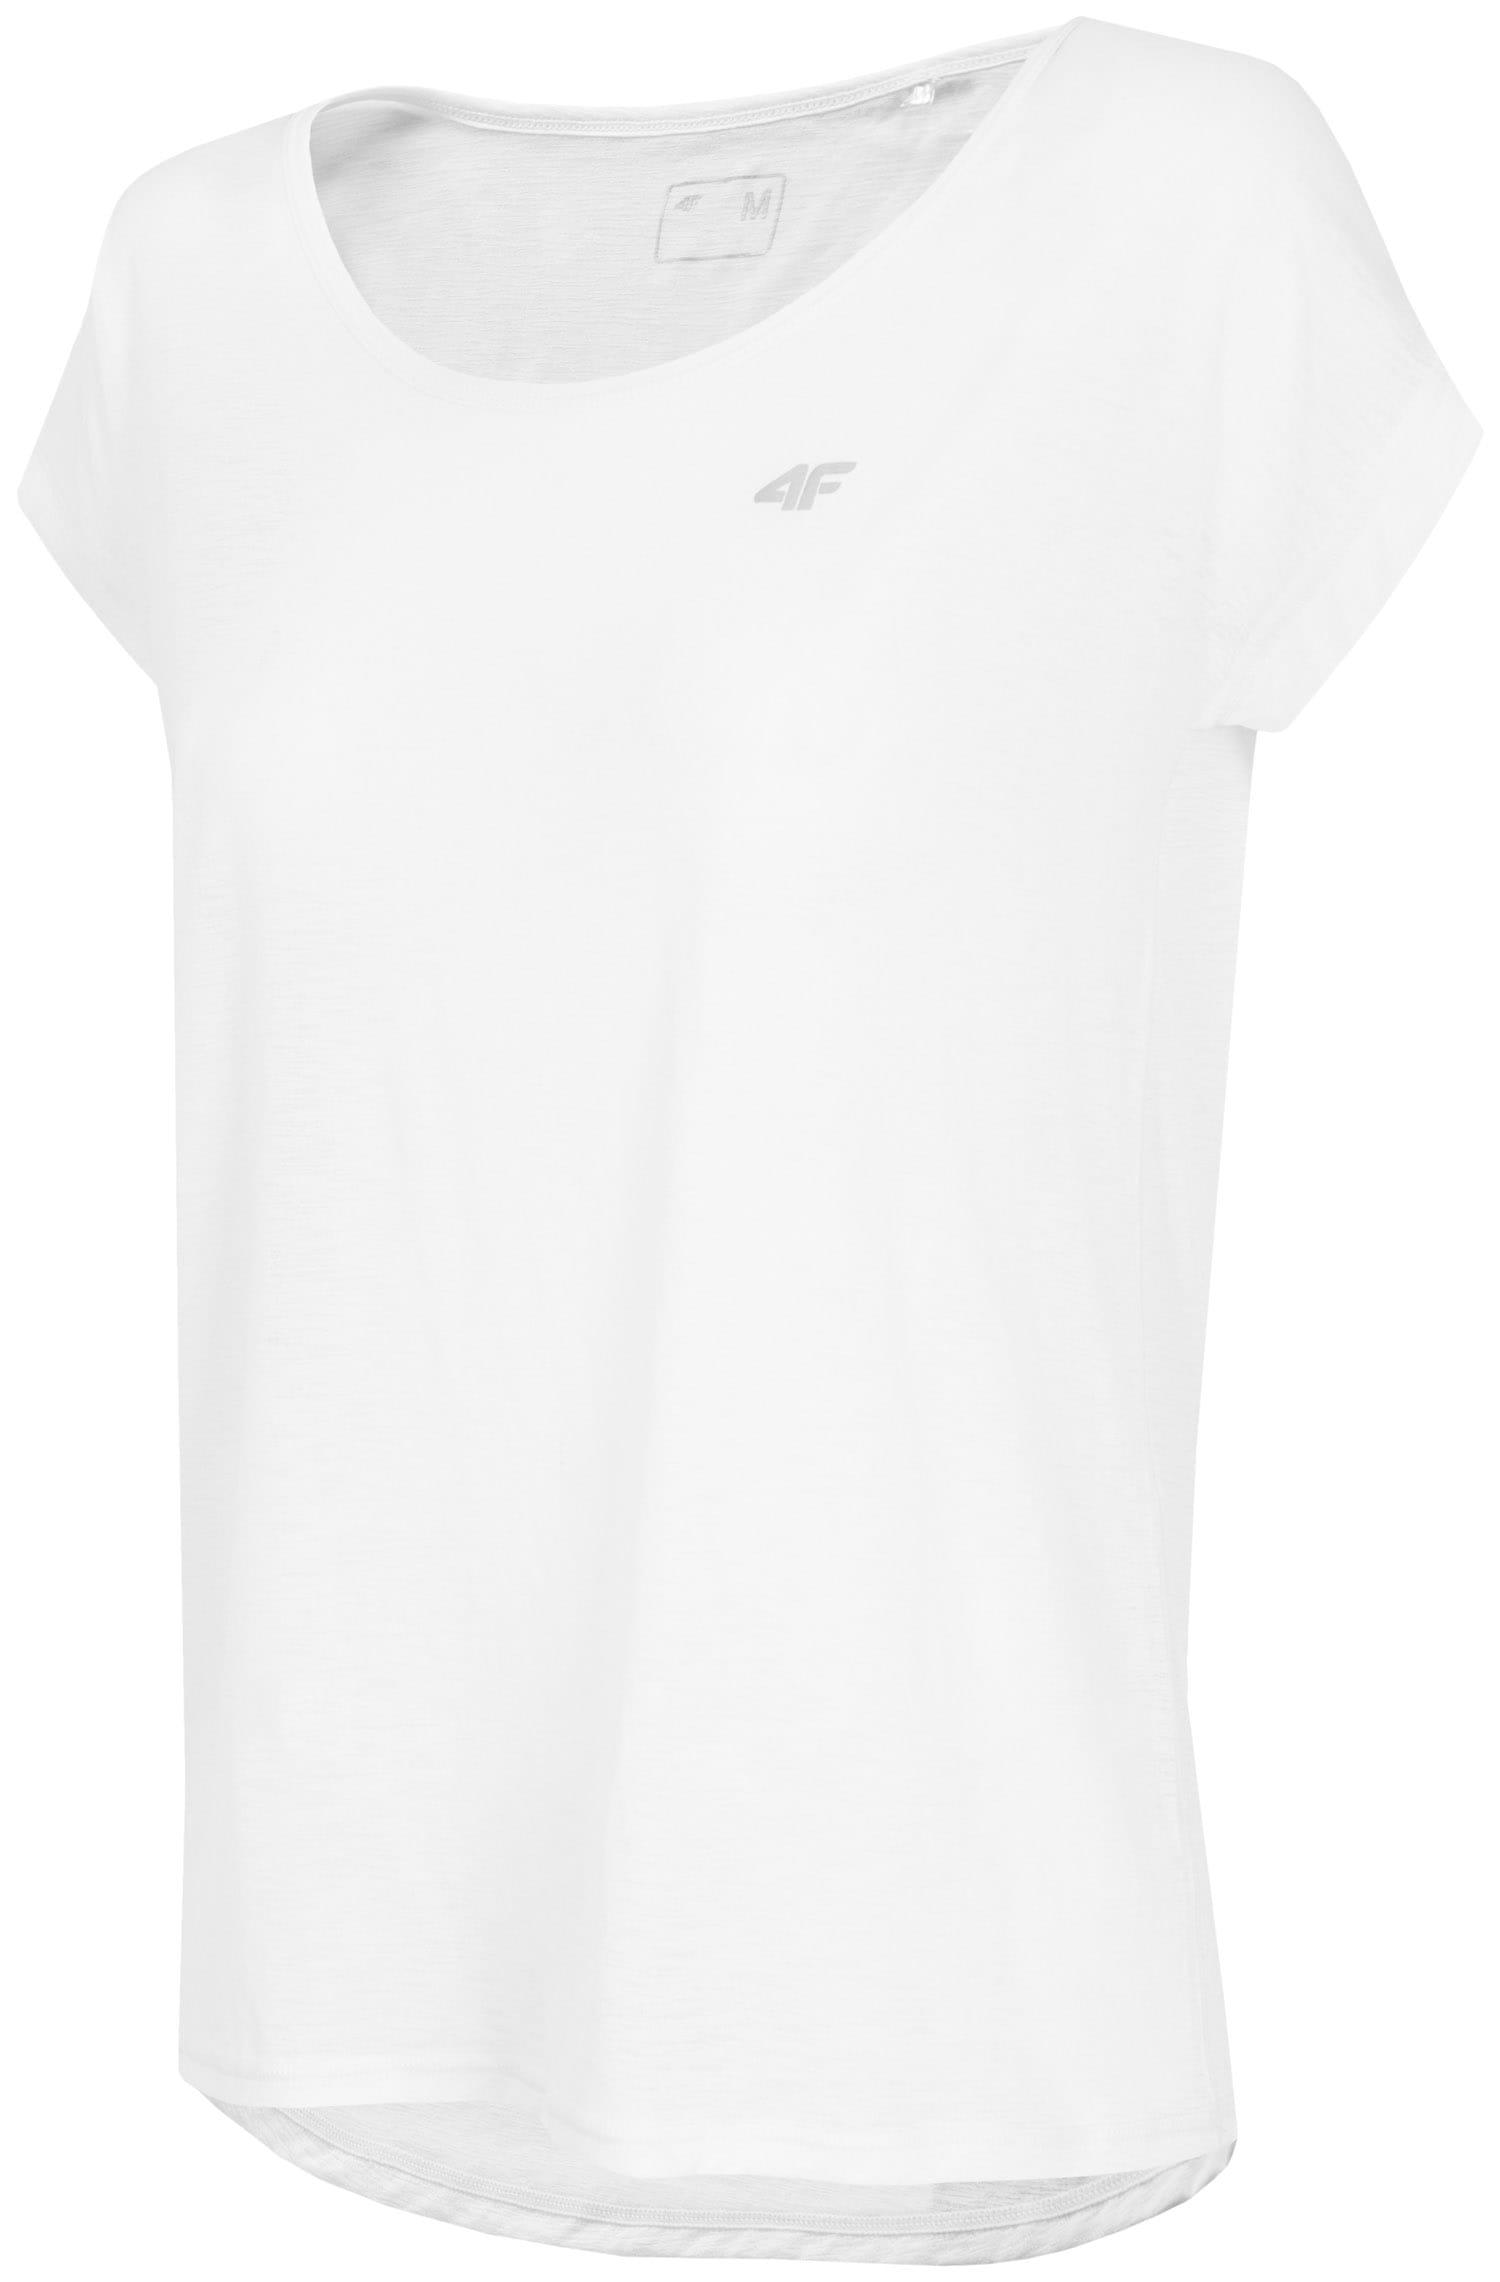 Koszulka treningowa damska TSDF275 - biały melanż